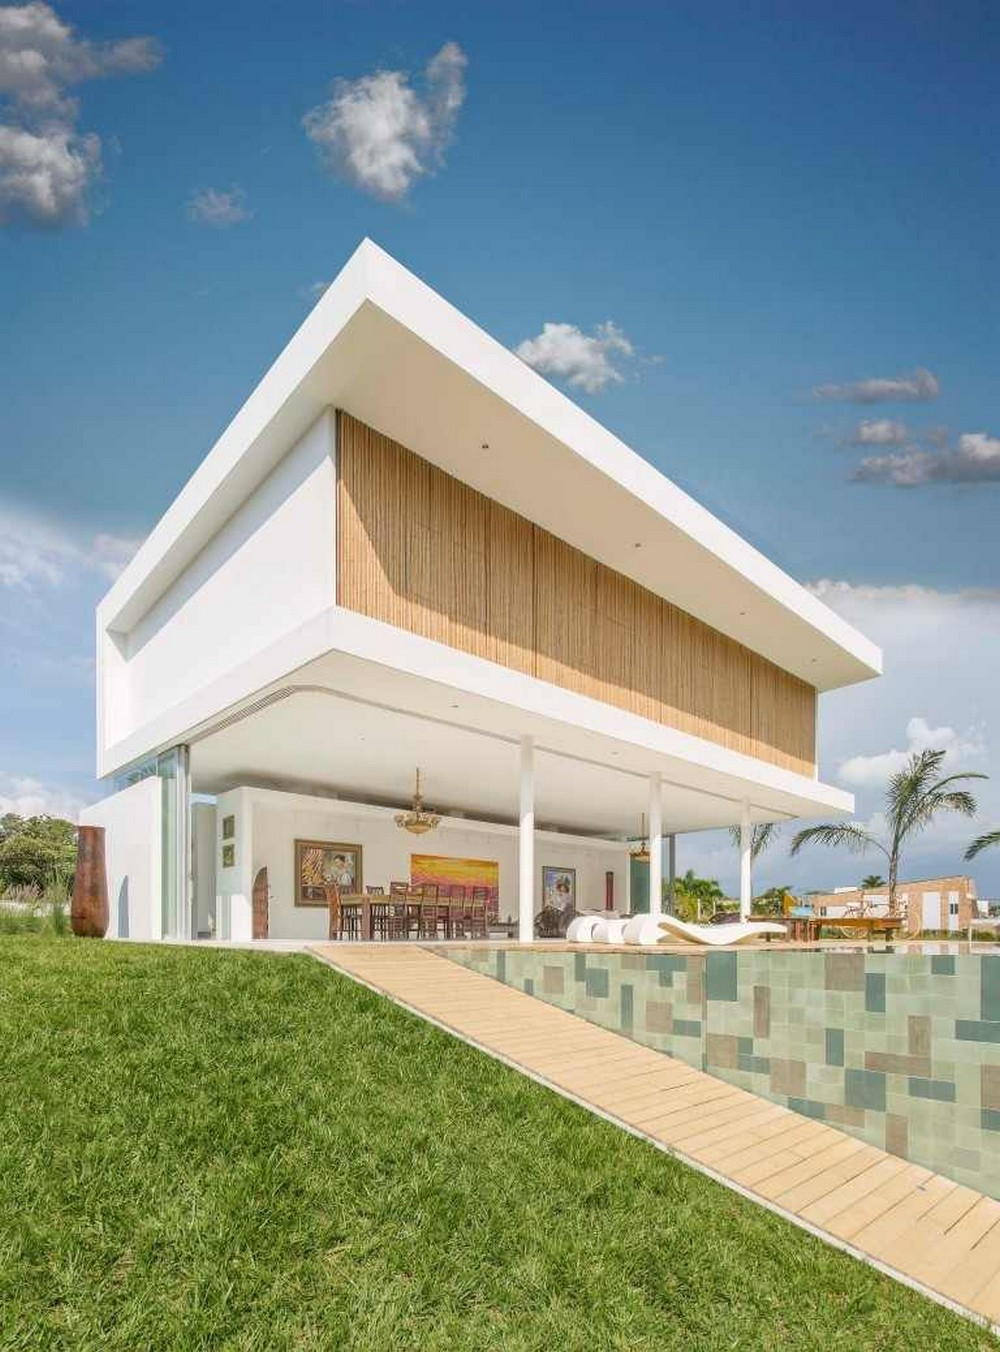 Casa dos sonhos 4